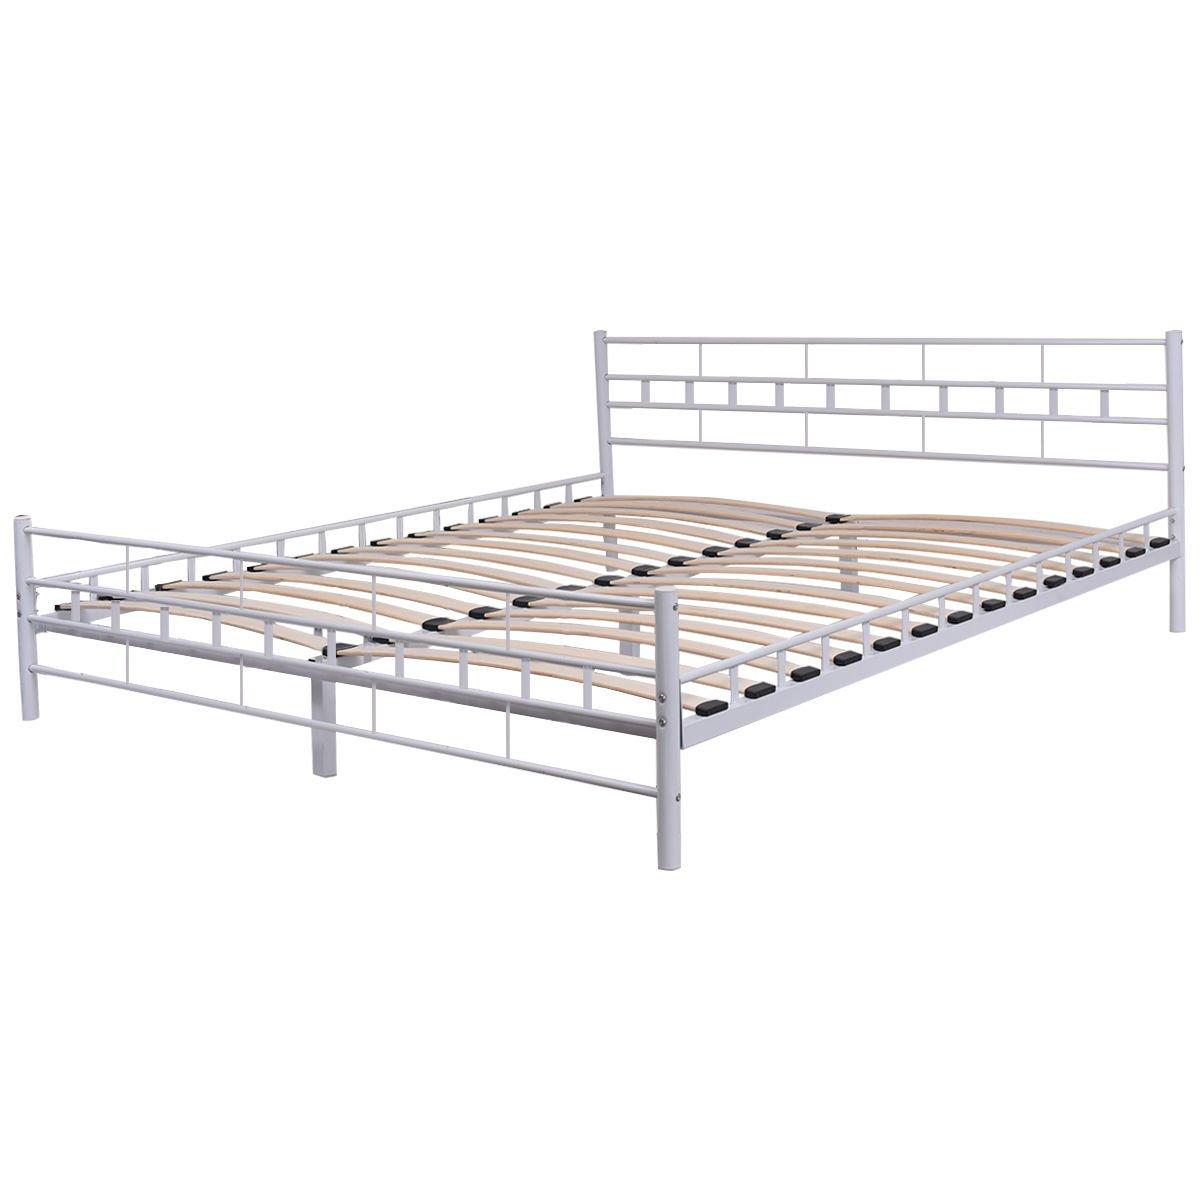 Giantex Wood Slats Bed Frame Platform Headboard Footboard Furniture (Queen, White)